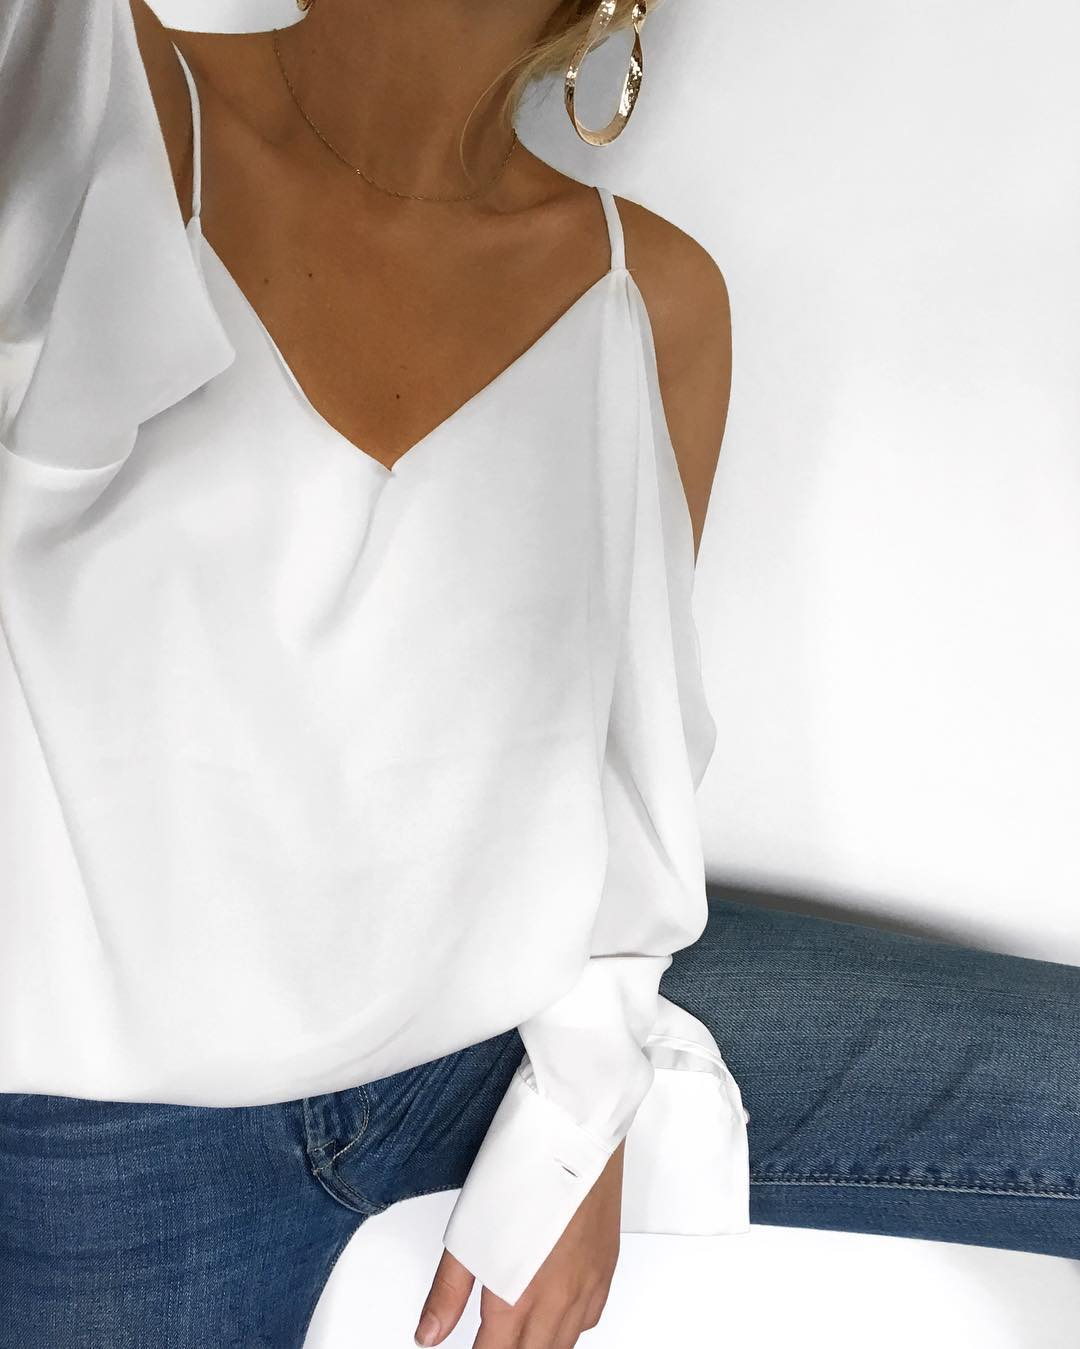 Off The Shoulder Trend Post by Fashion Wonderer (18)